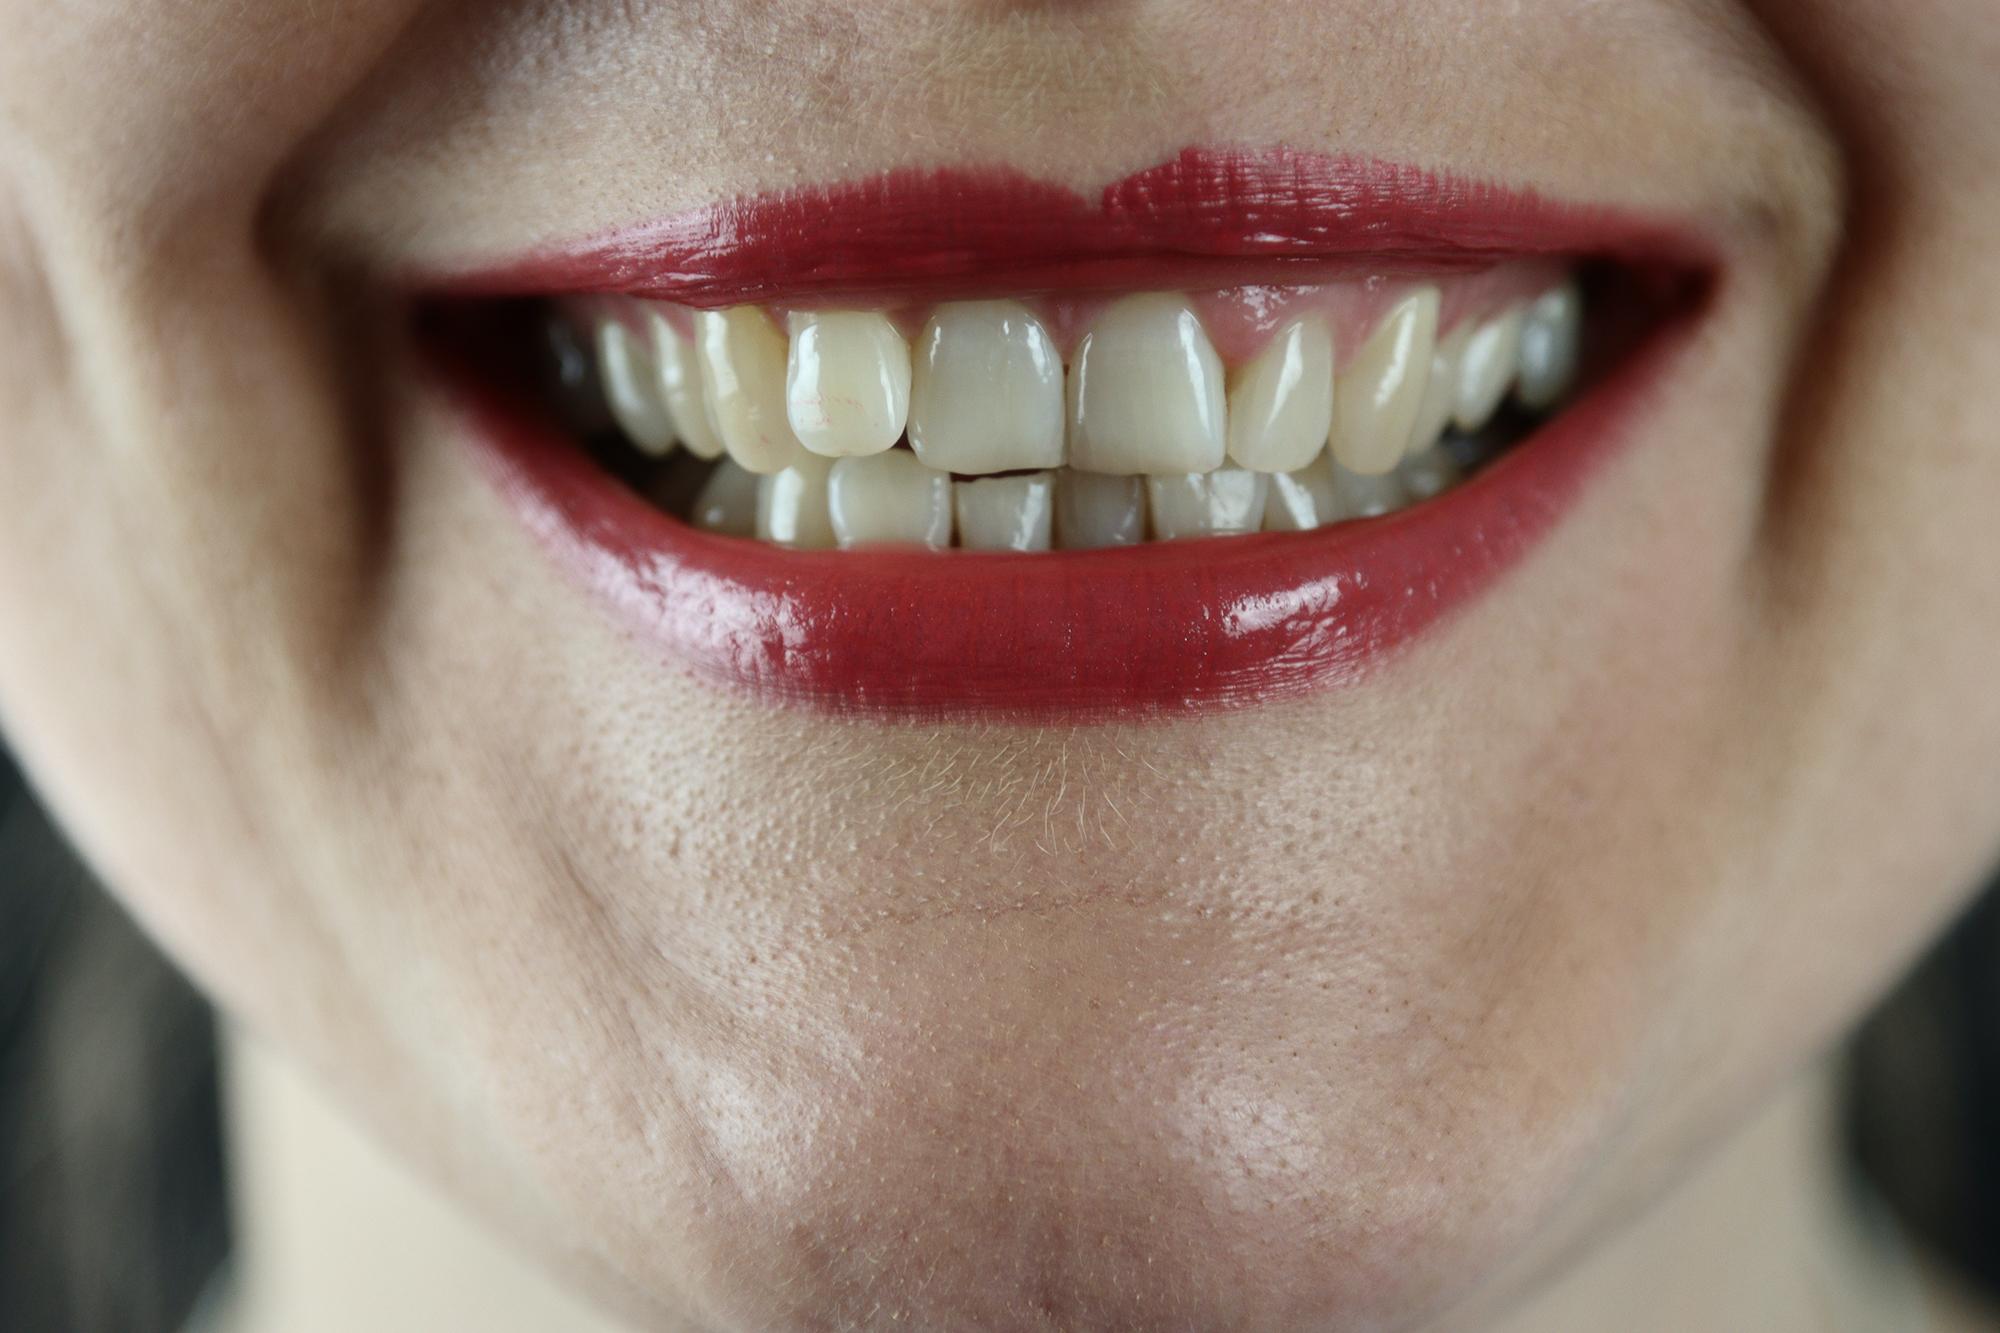 dentist in Bensalem, PA